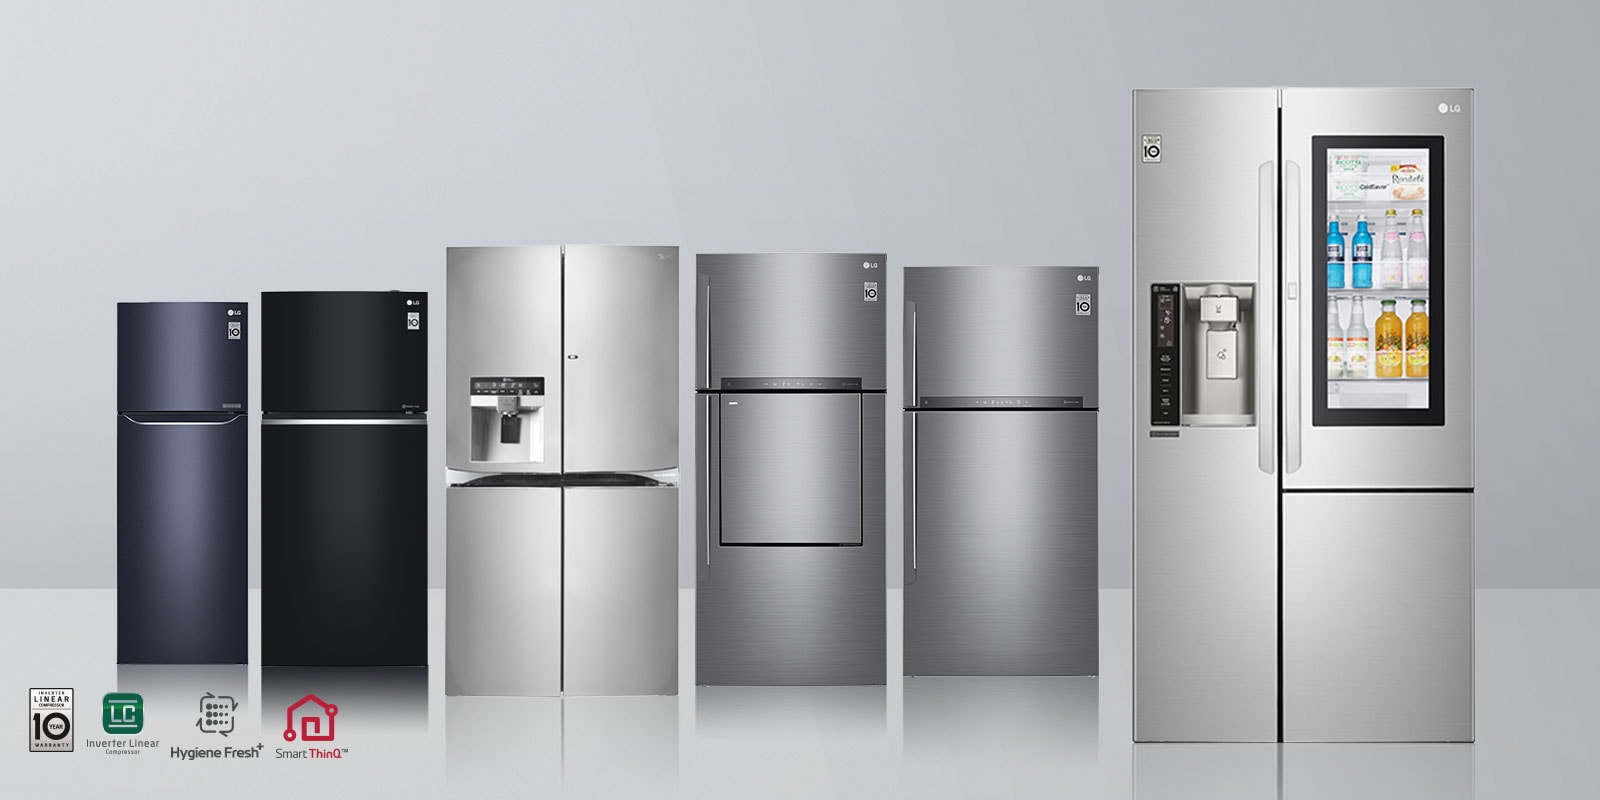 Lg Refrigerators 10 Years Warrantee On Fridges Inverter